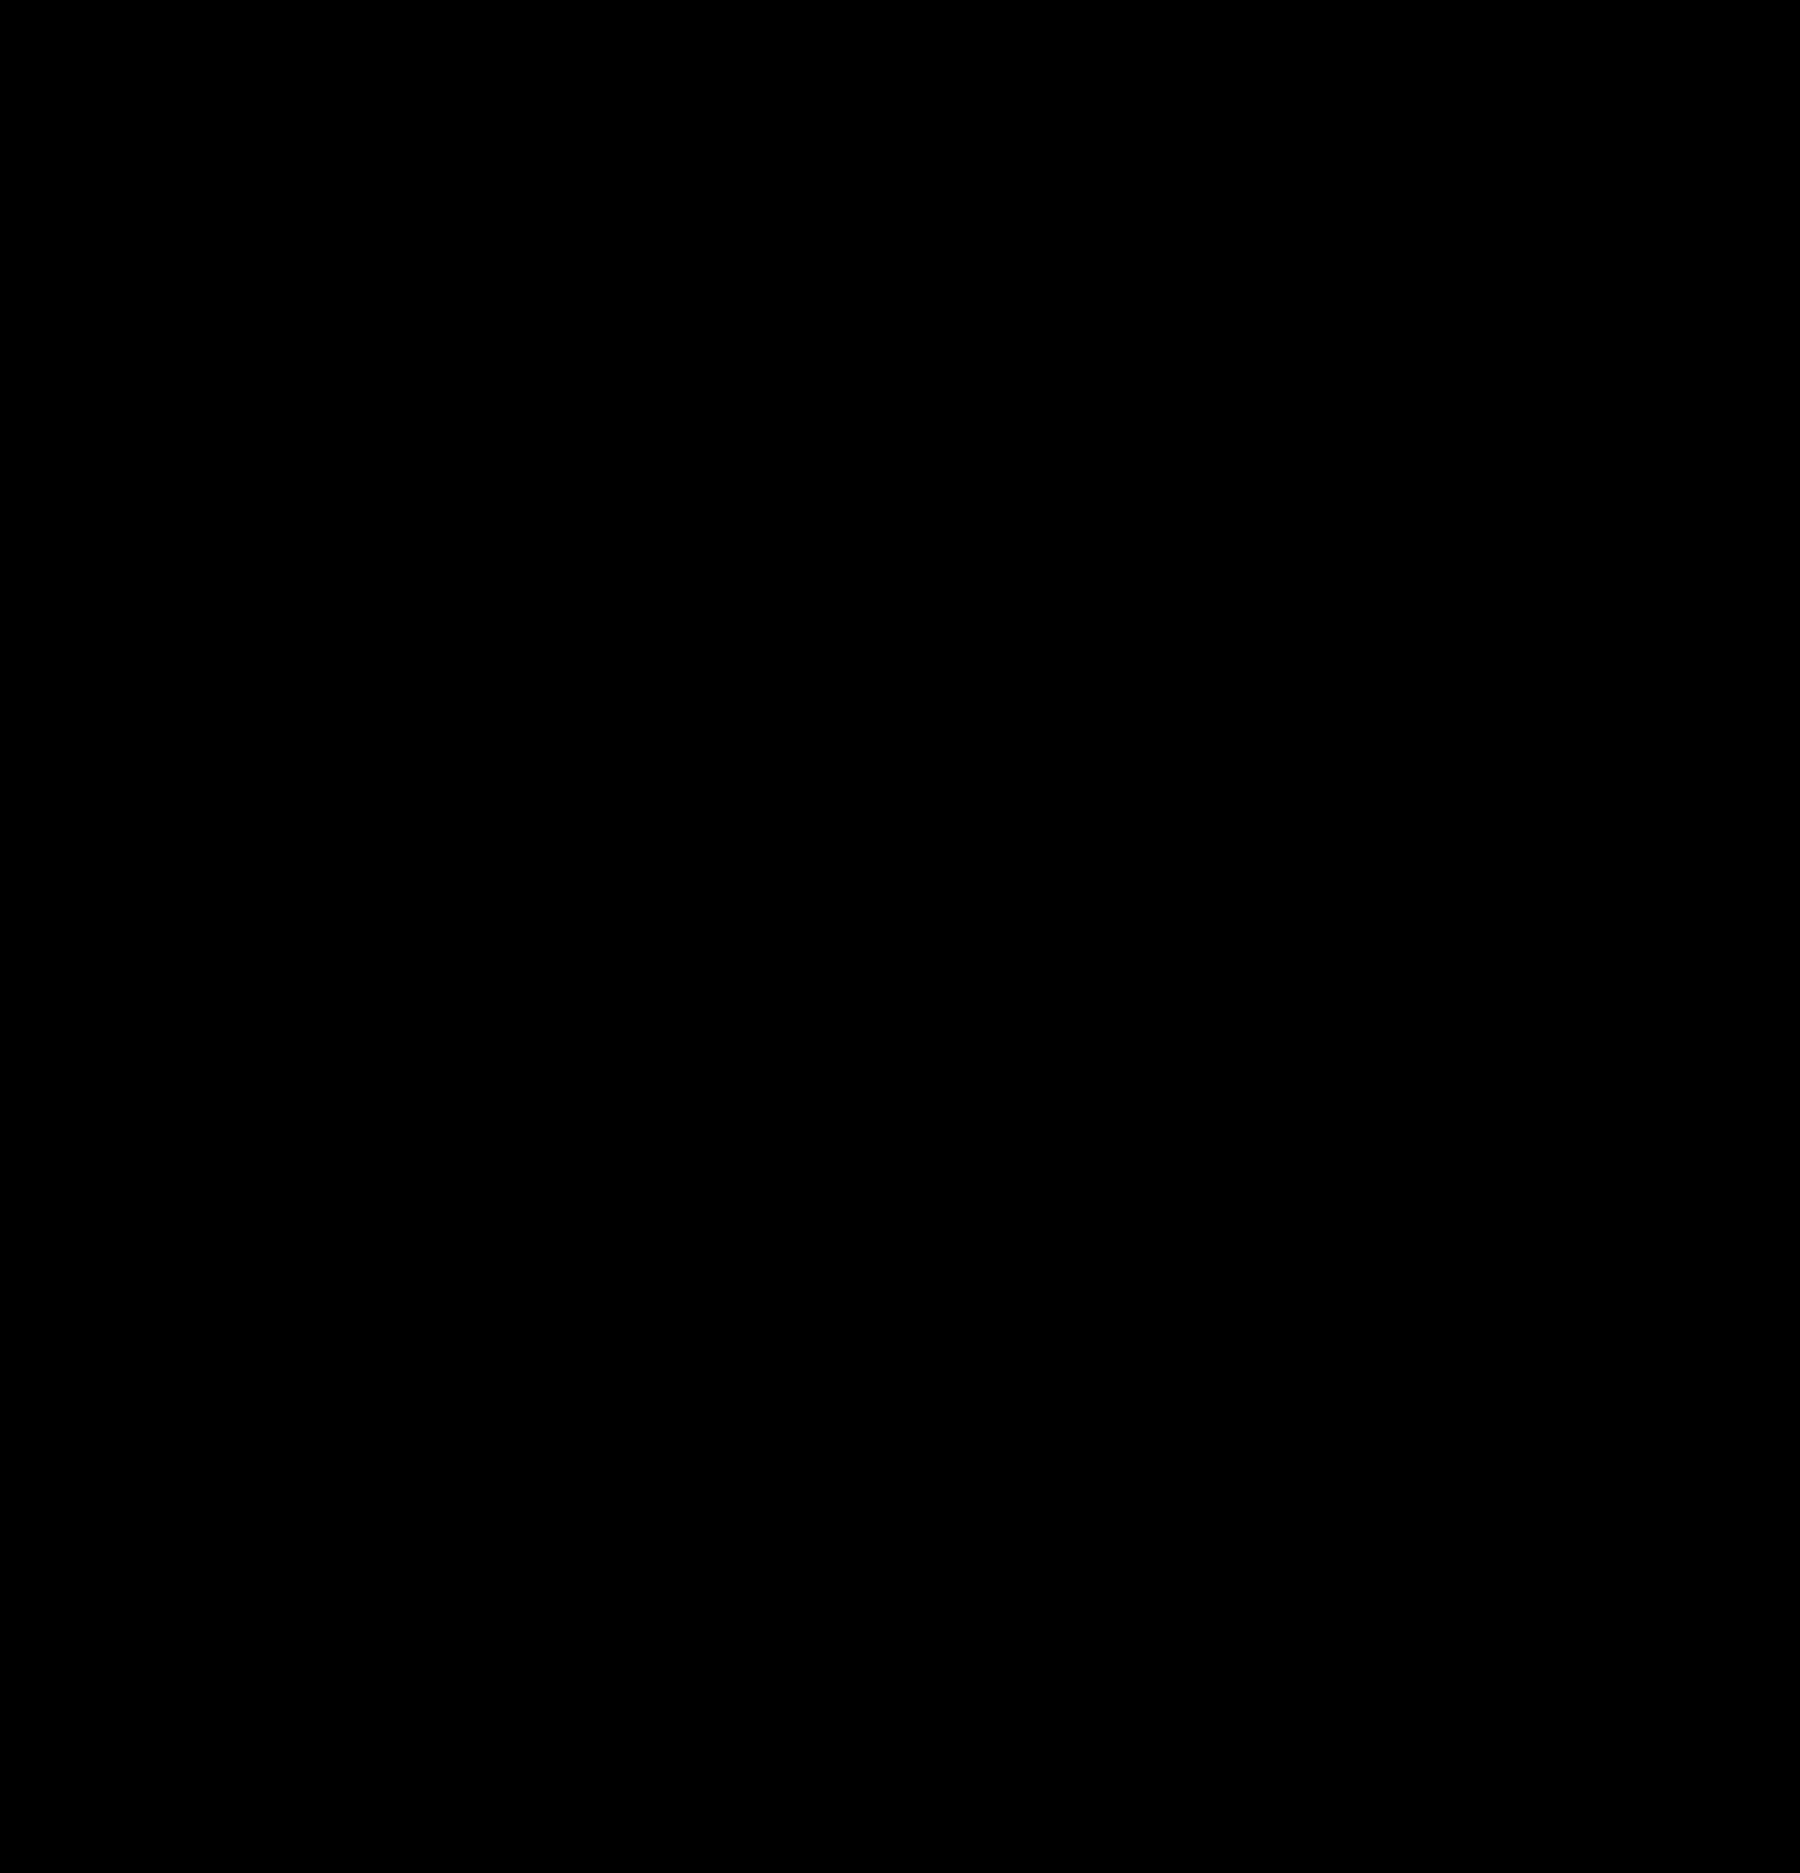 Marine Corps Logo Vector at GetDrawings.com.